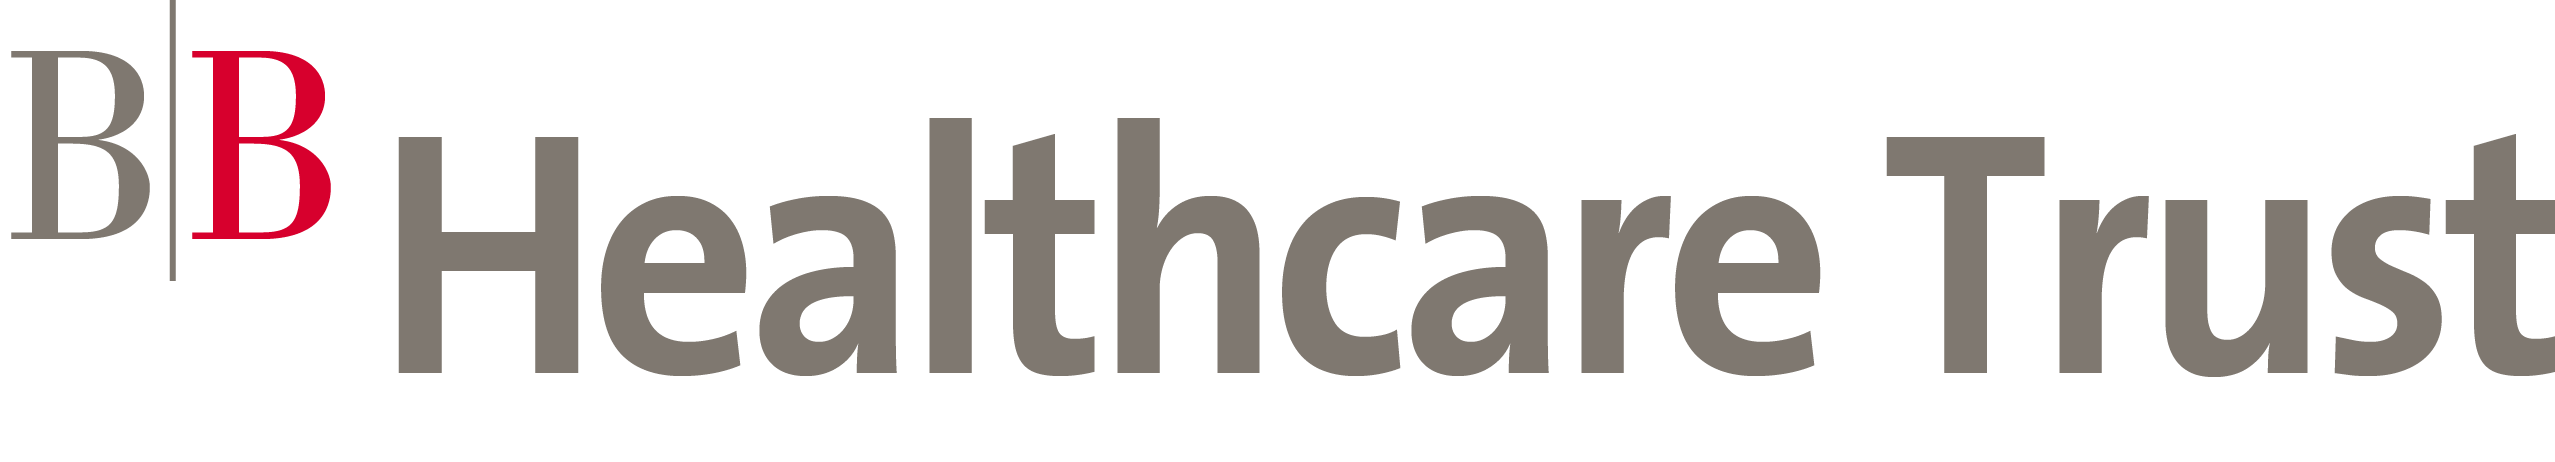 BB HEALTHCARE TRUST PLC Logo